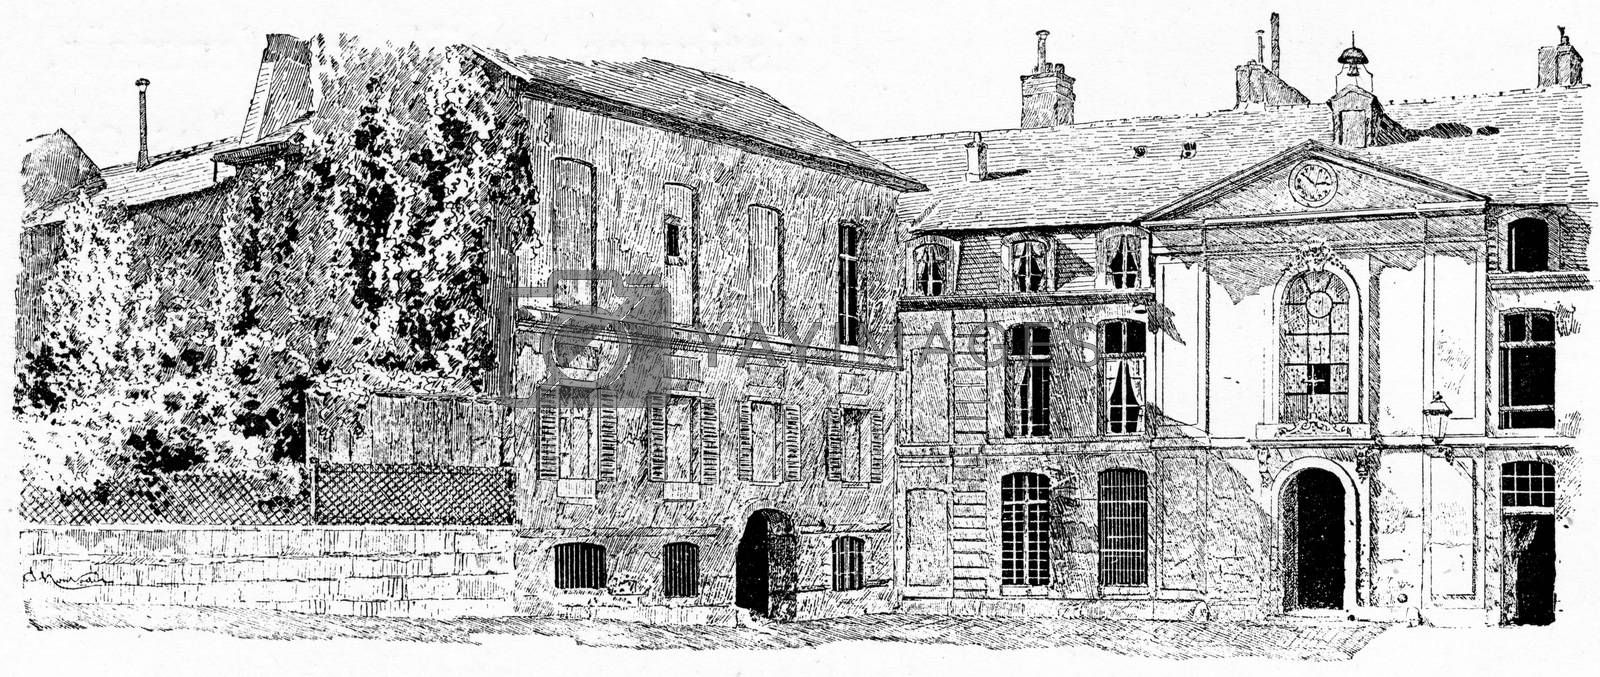 The old buildings of the Gobelins, vintage engraved illustration. Paris - Auguste VITU – 1890.